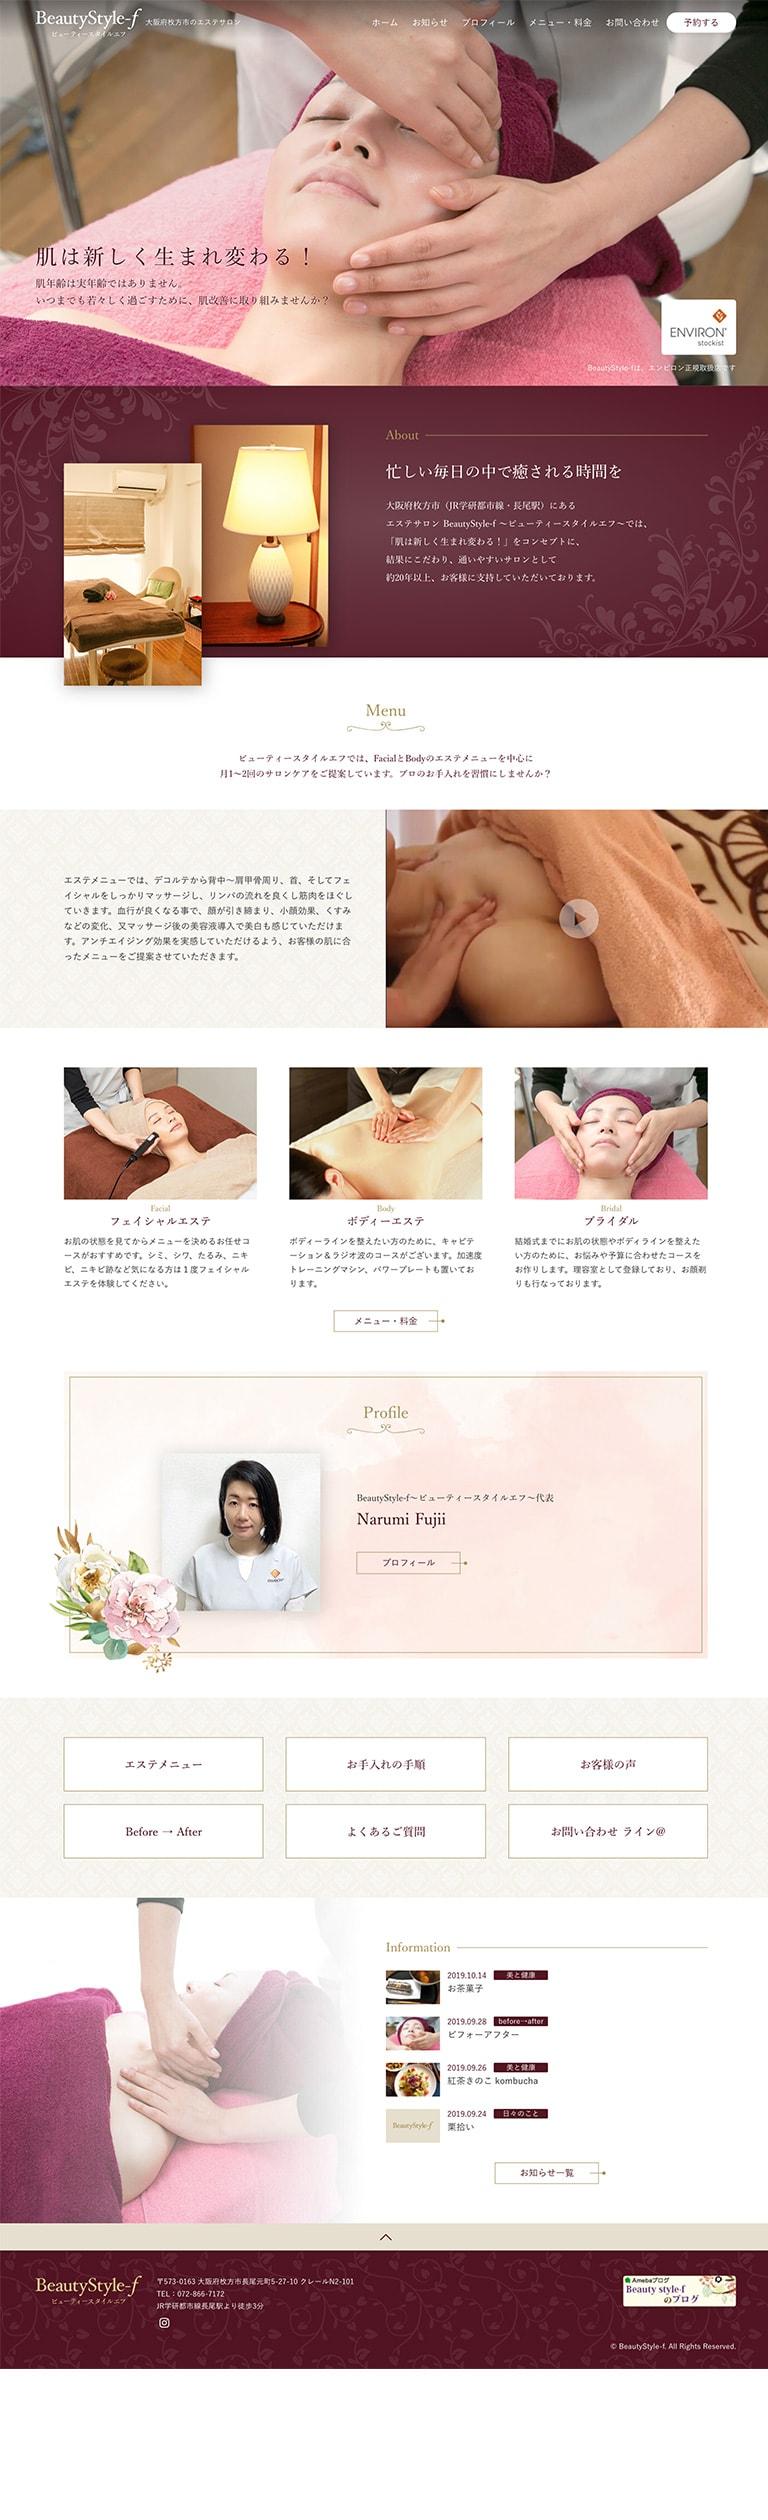 BeautyStyle-f Webサイト